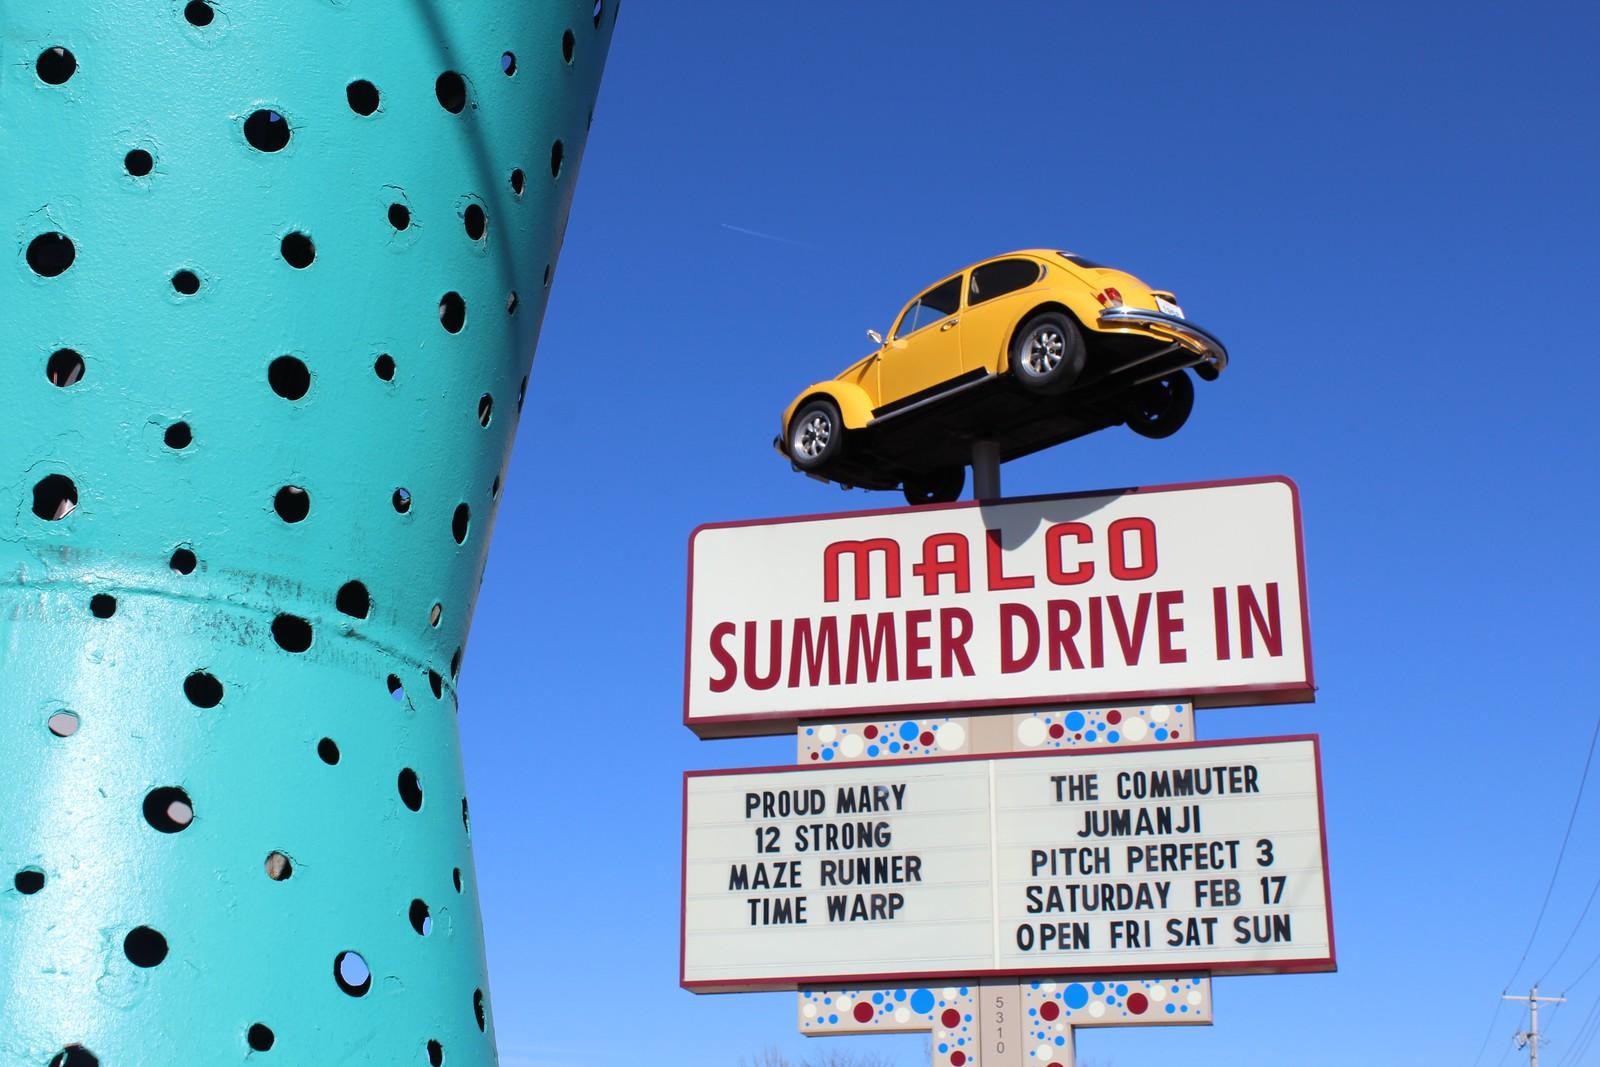 Malco Summer Drive In